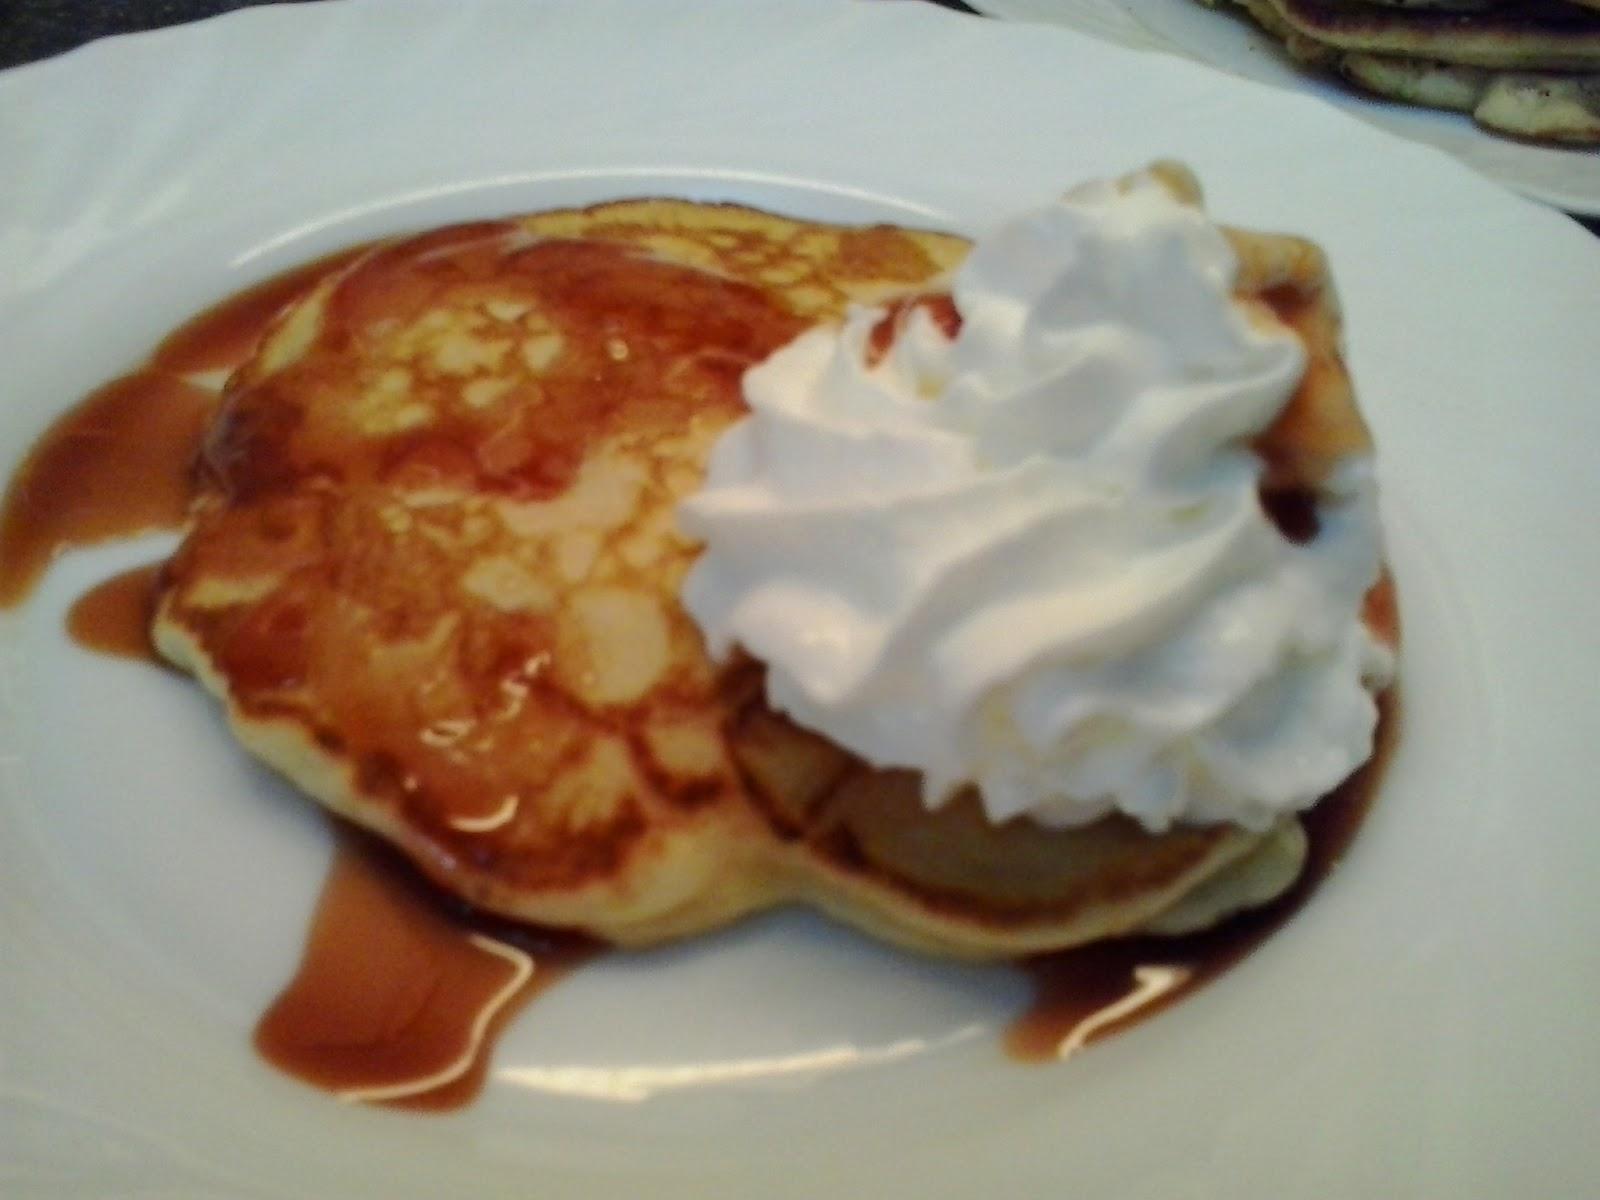 Mi maravilloso rinc n de reposter a creativa tortitas con - Ingredientes reposteria creativa ...